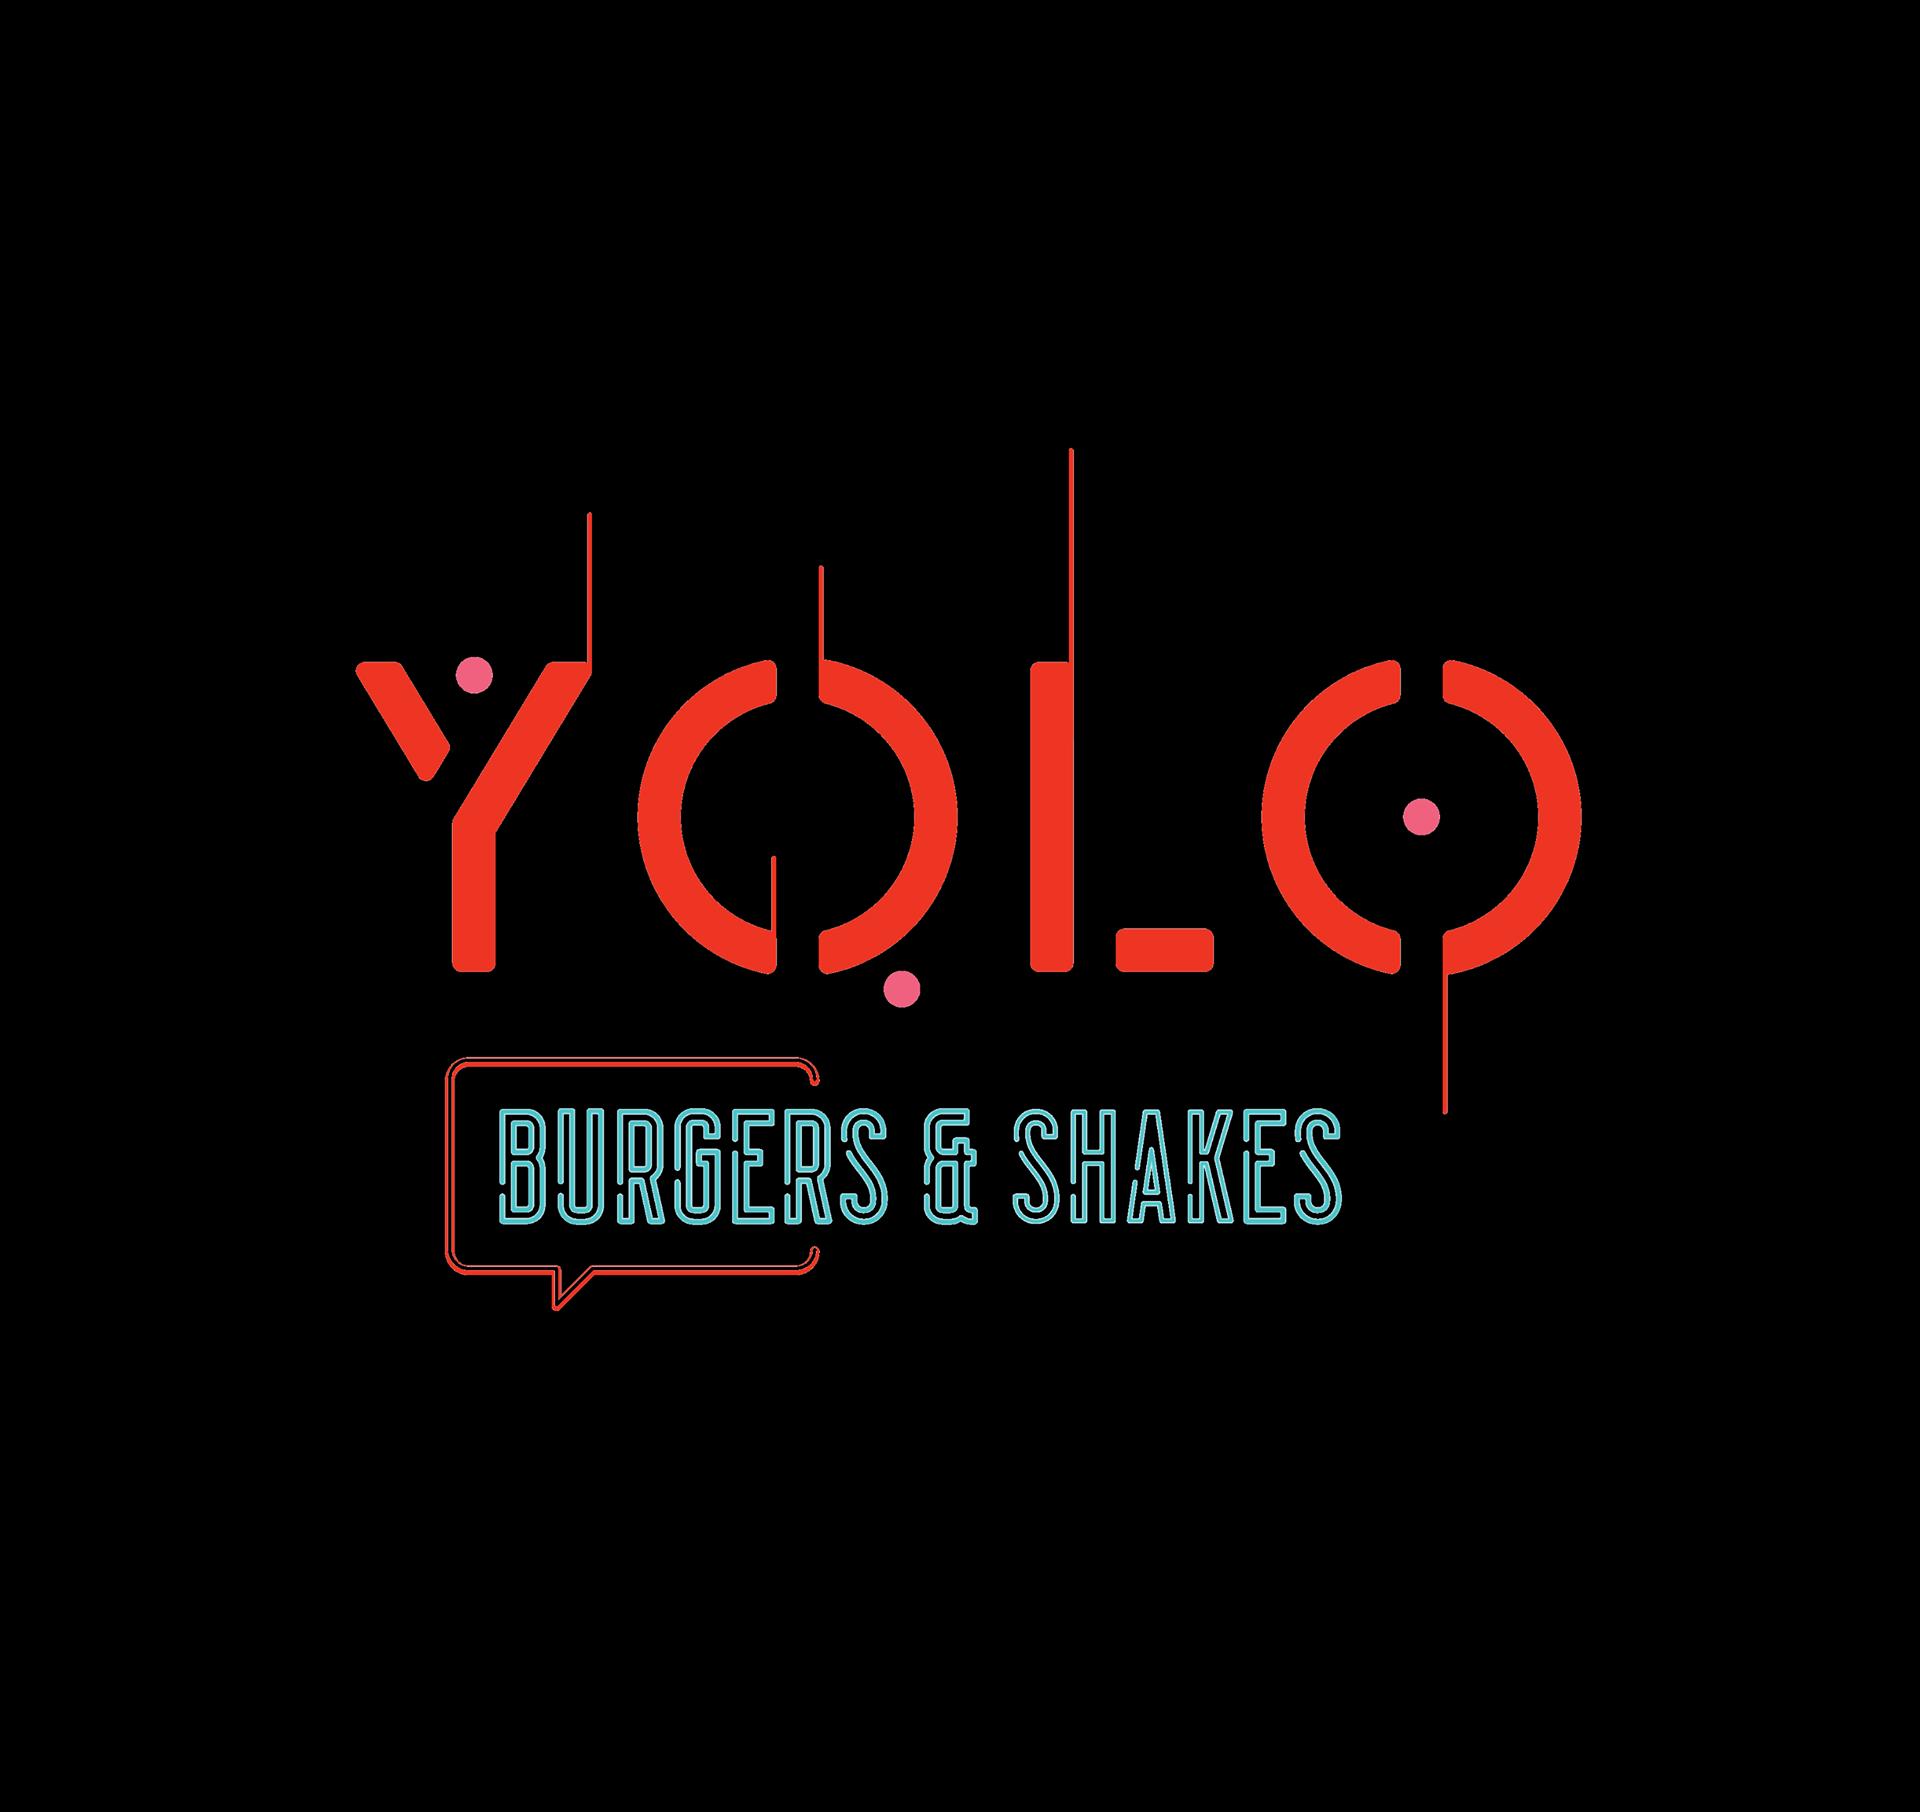 YOLO Burgers & Shakes